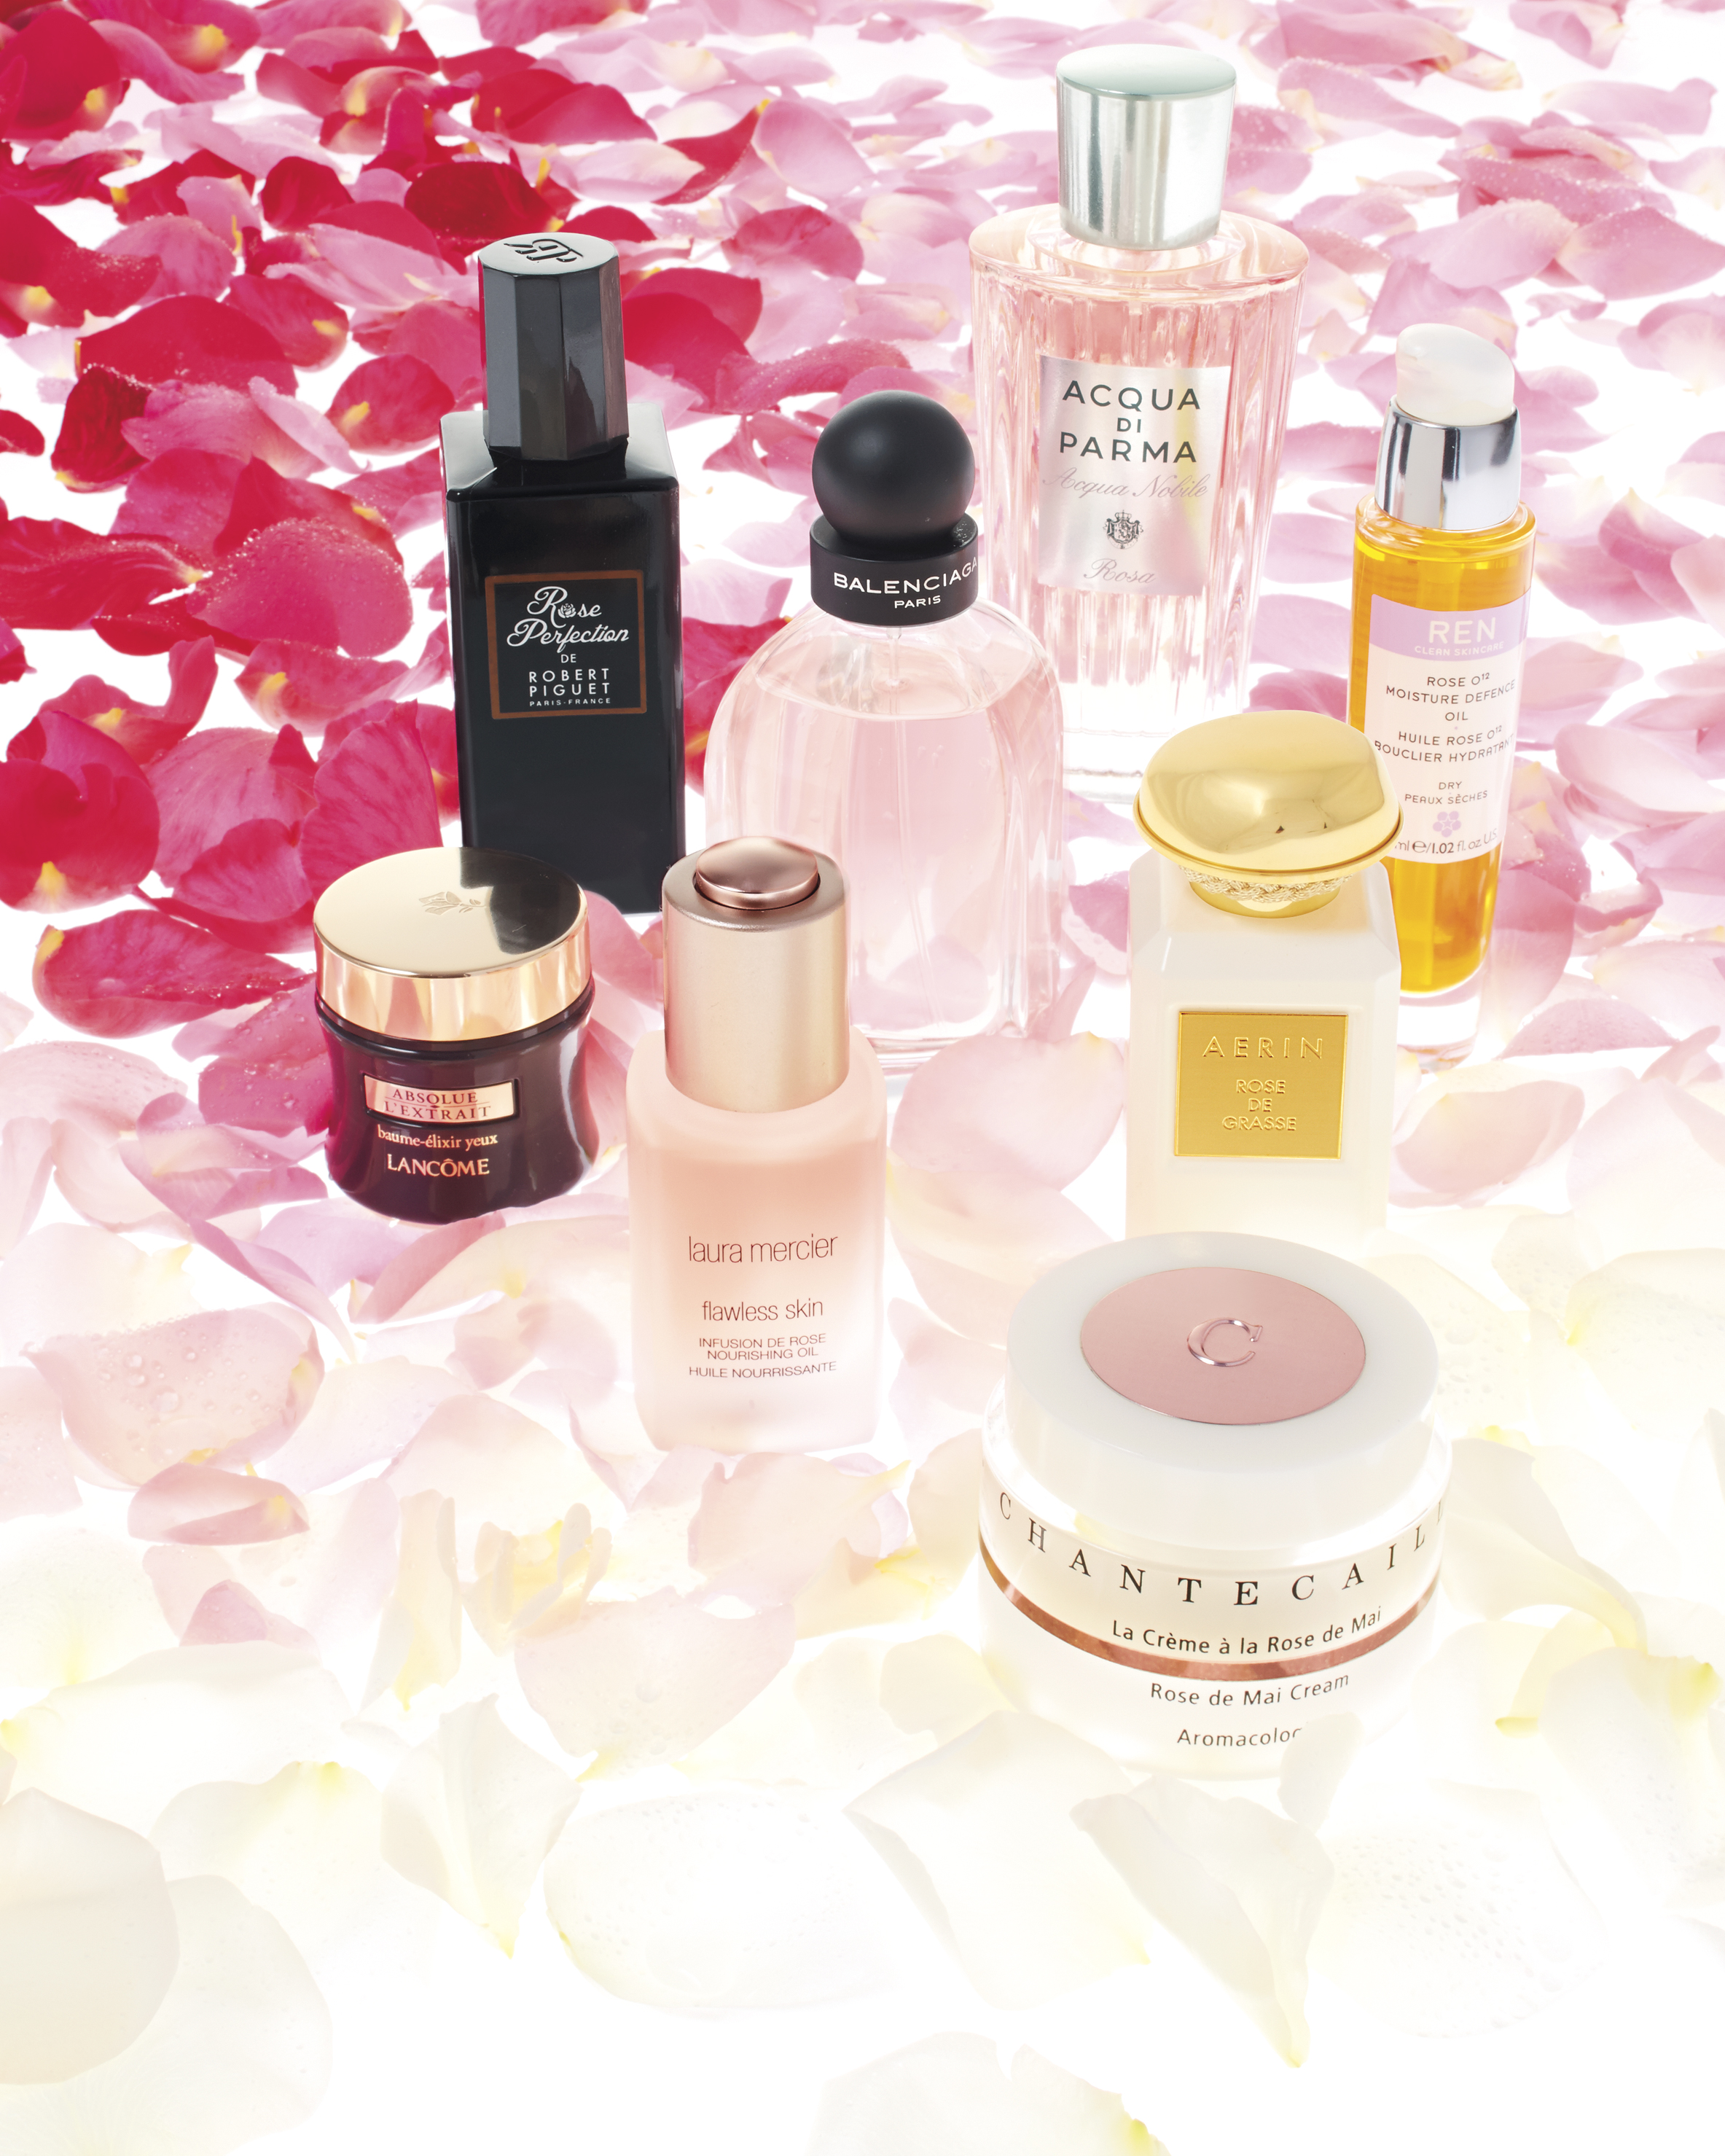 summer-beauty-rose-products-petals-786-d111967.jpg